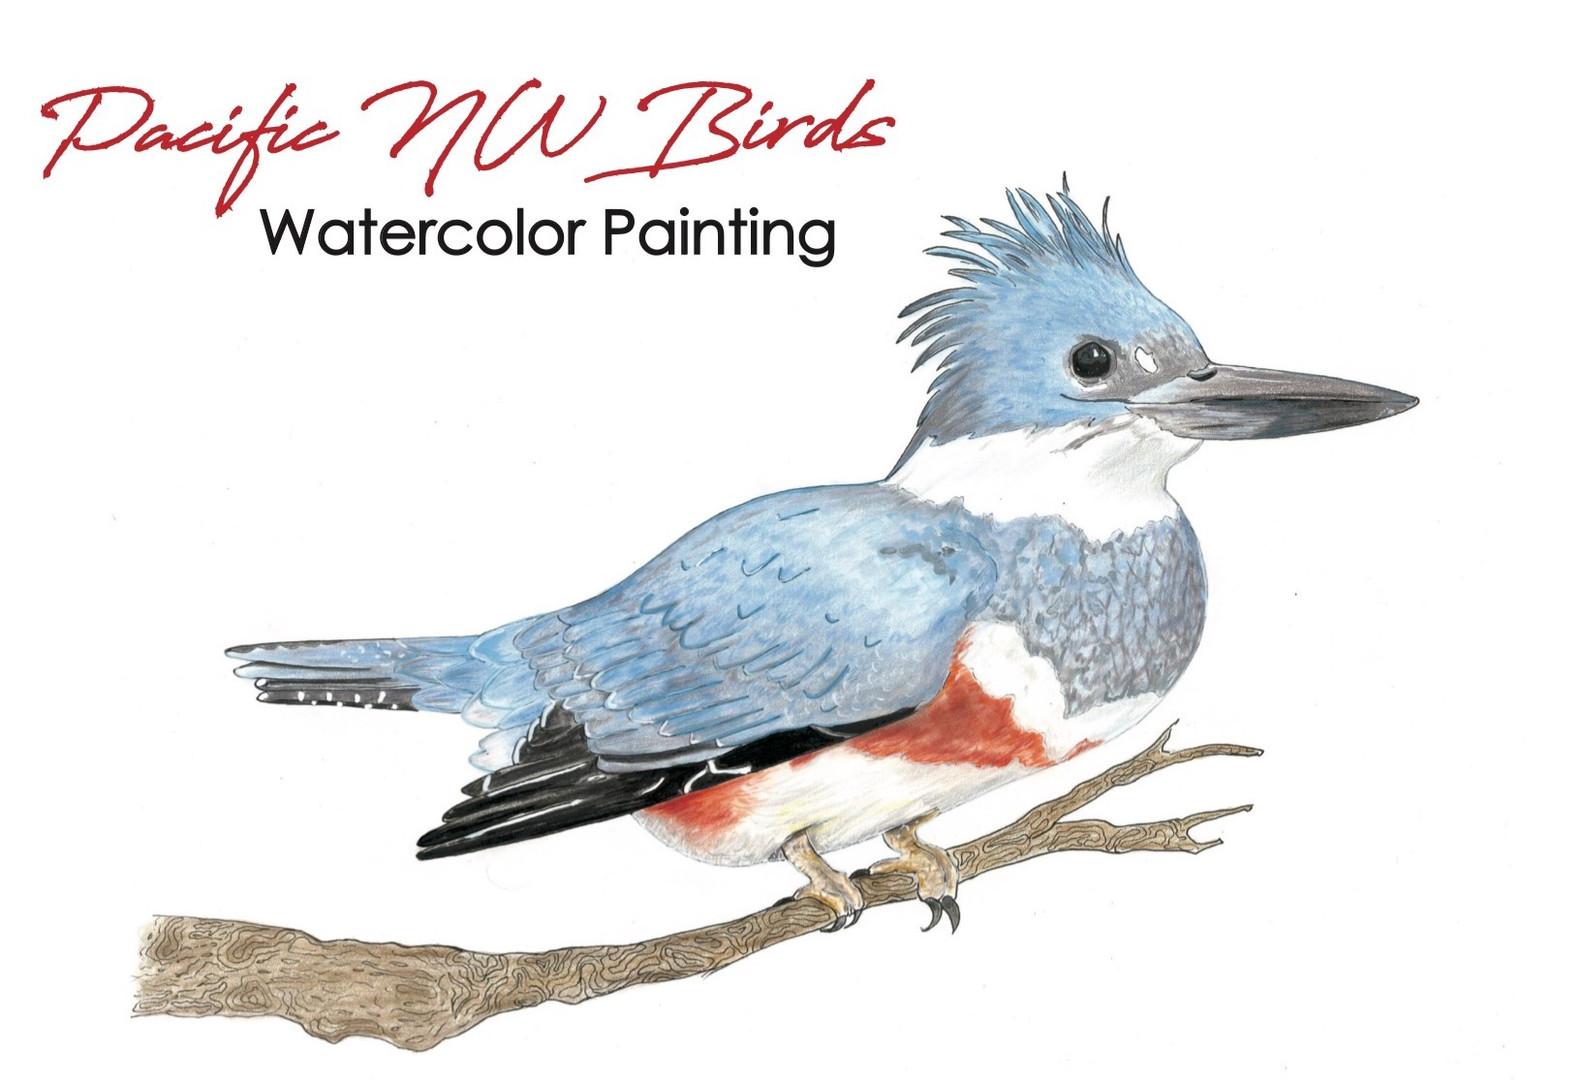 PNW Birds Watercolor Mixed Media book